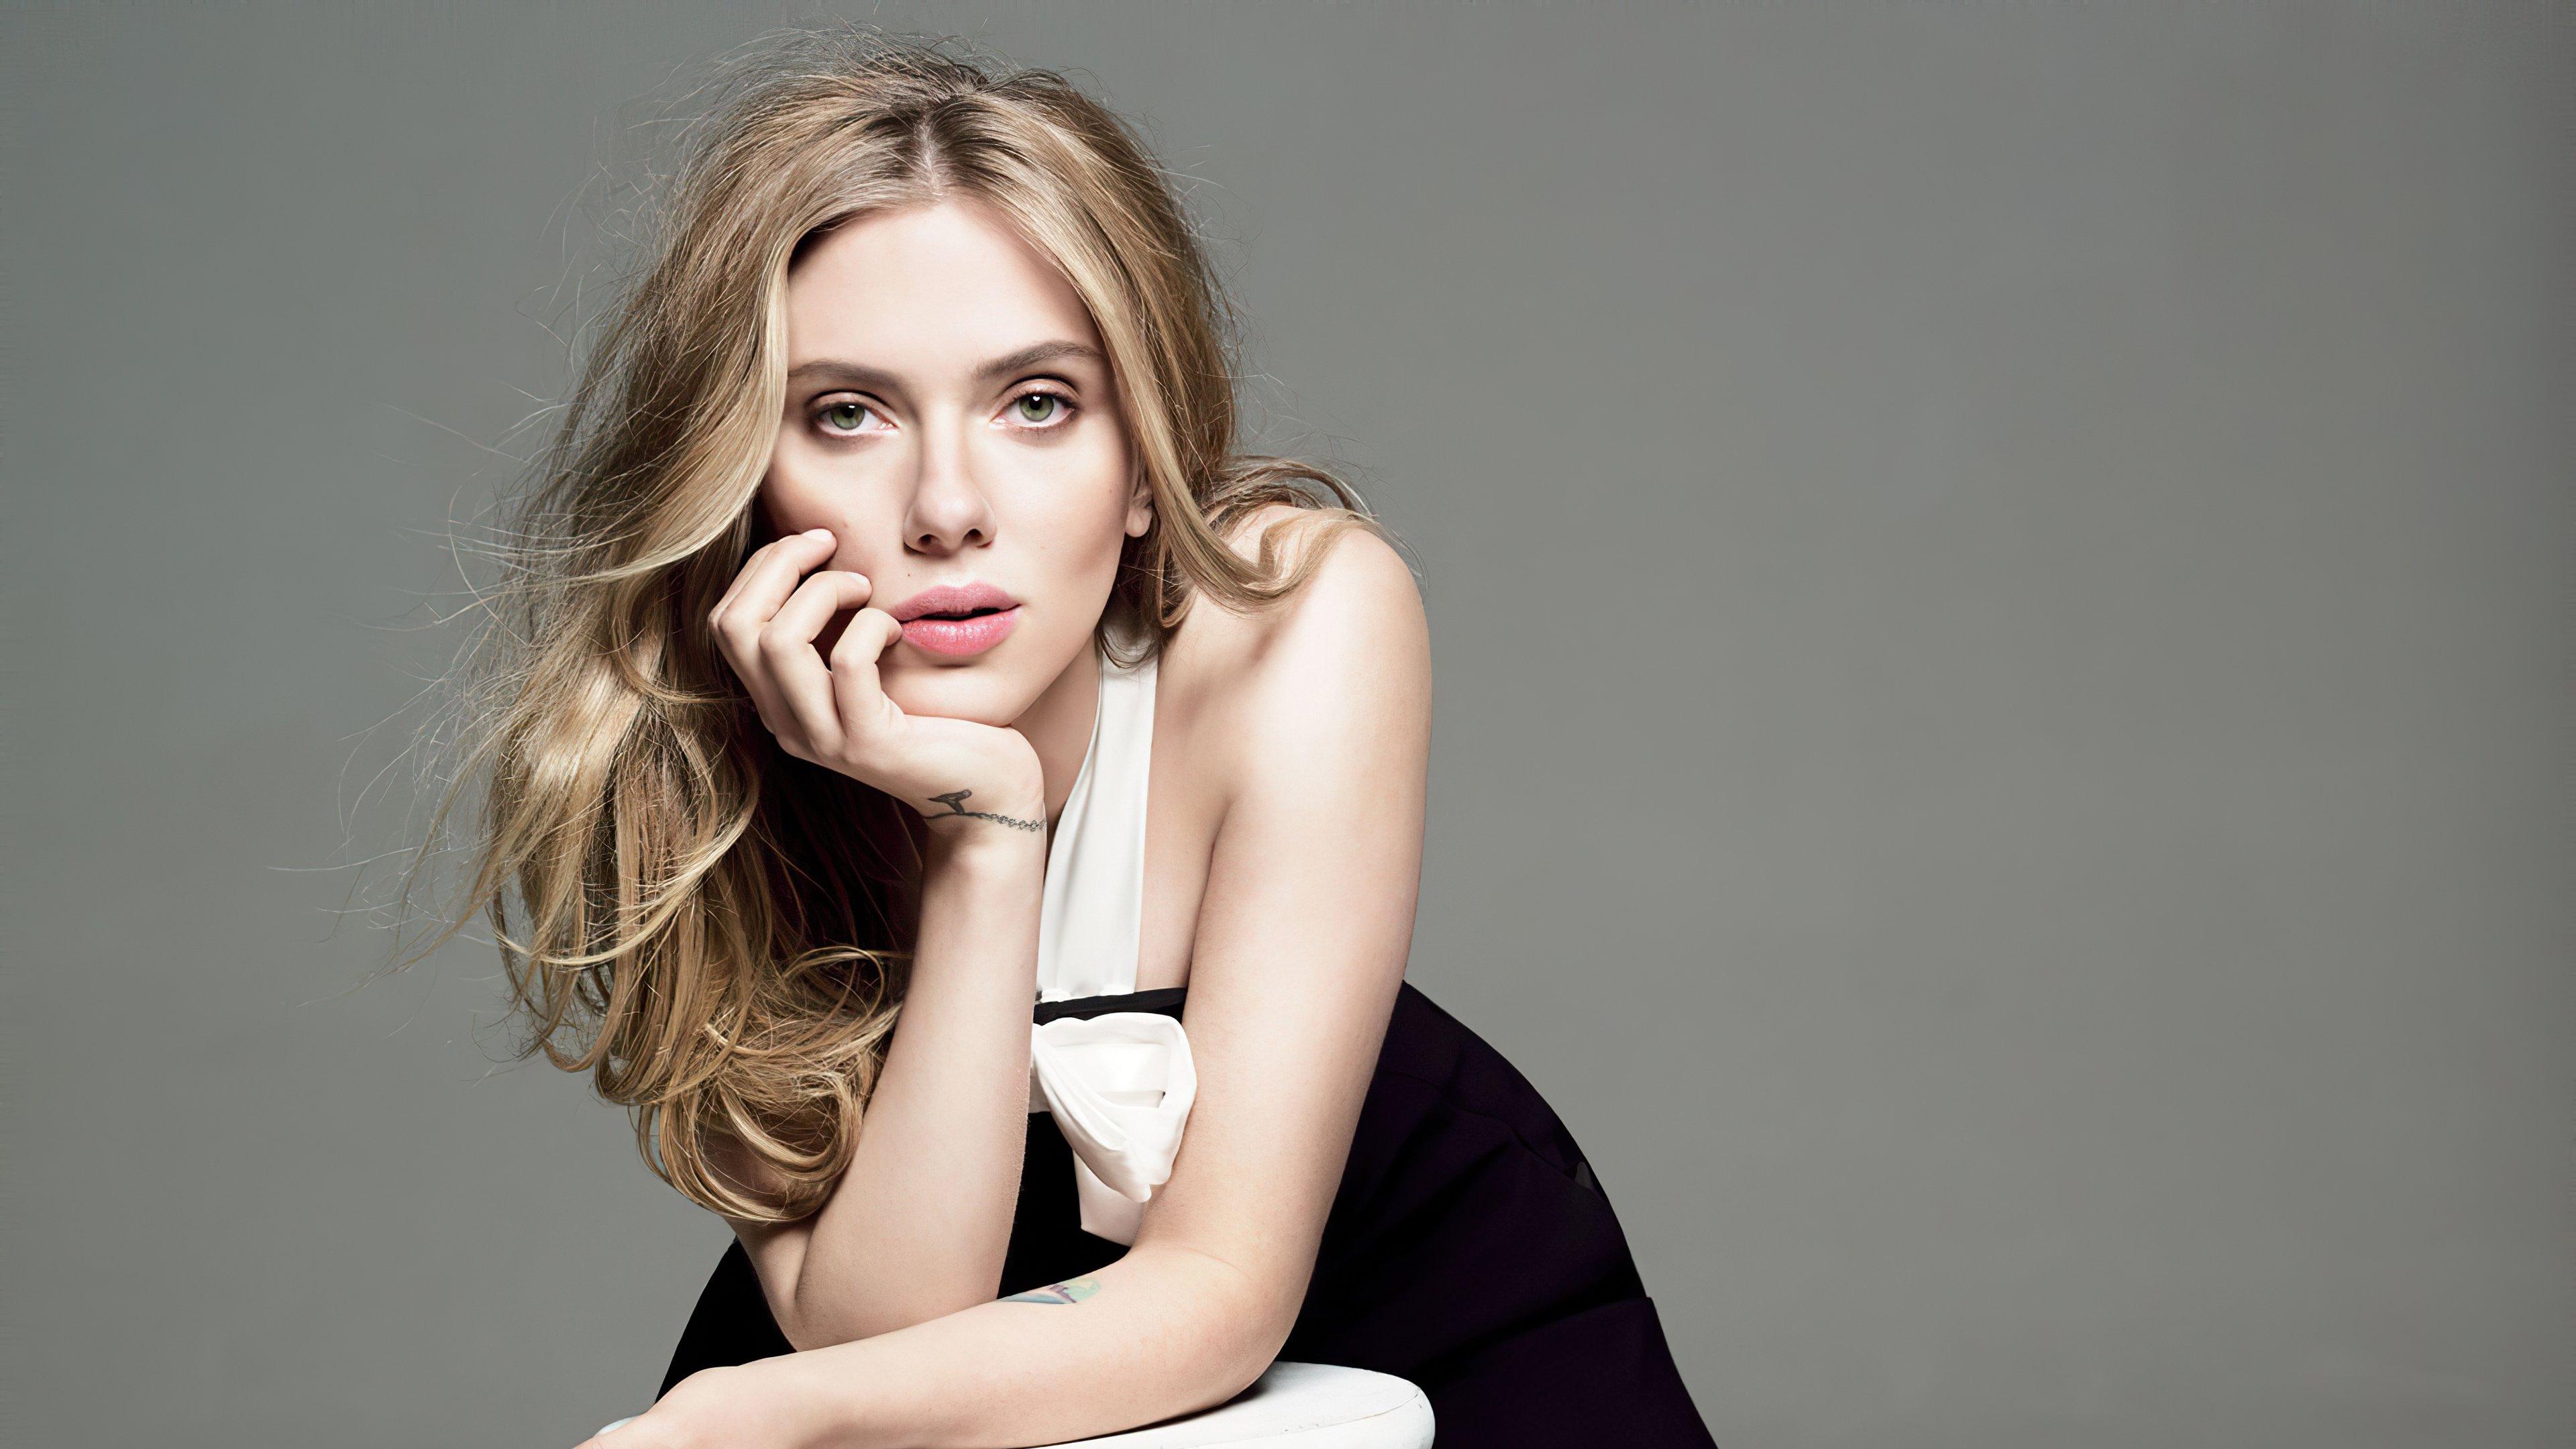 Wallpaper Scarlett Johansson black dress blonde